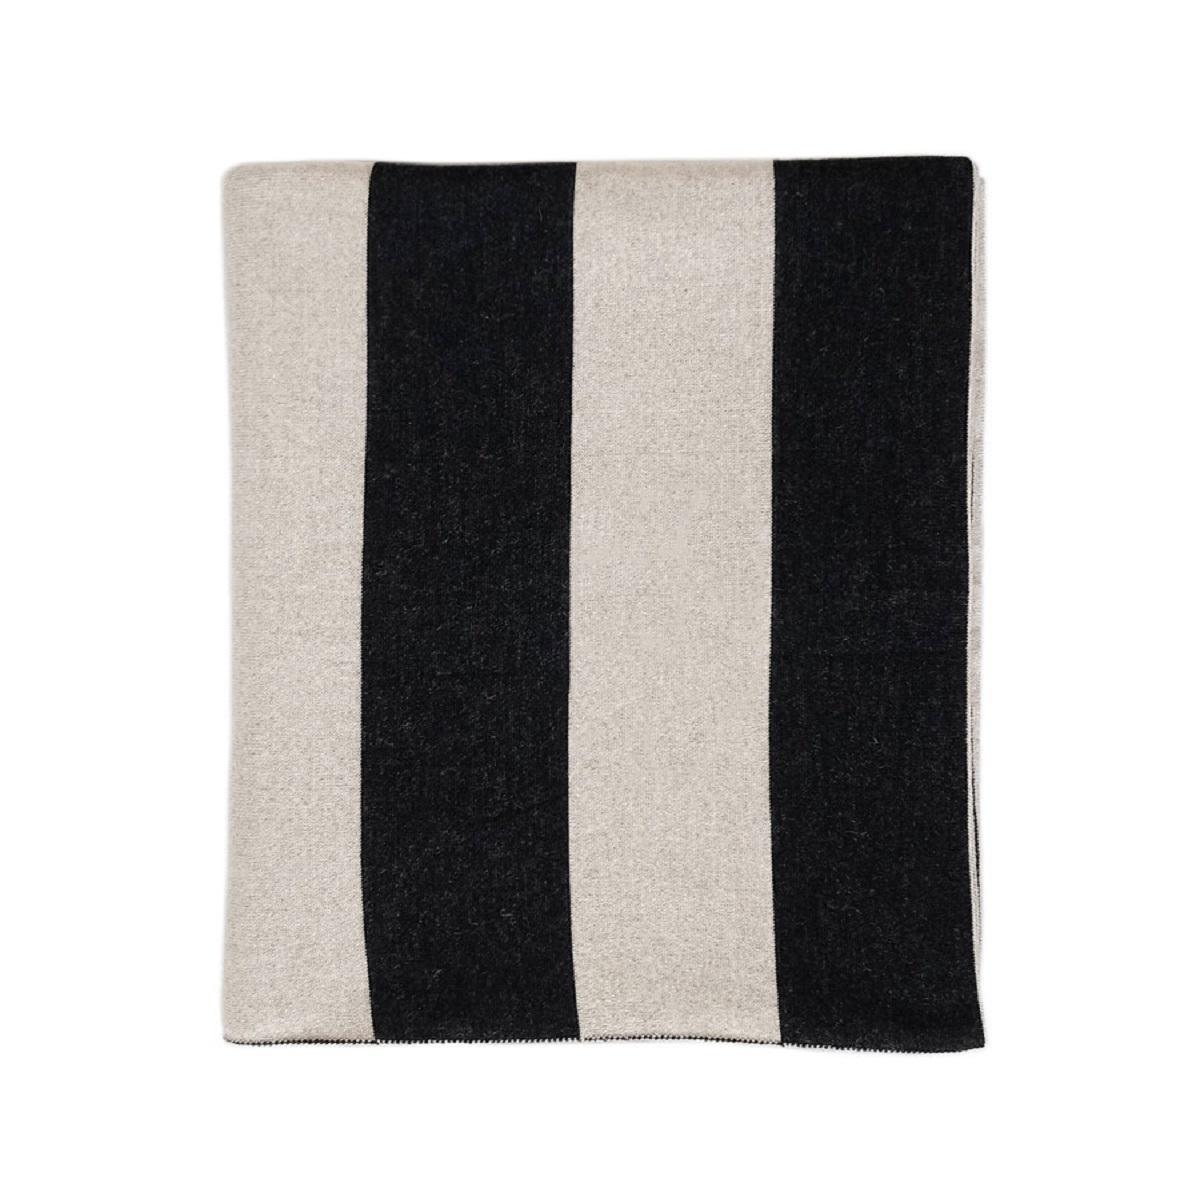 infinity-sand-blanket